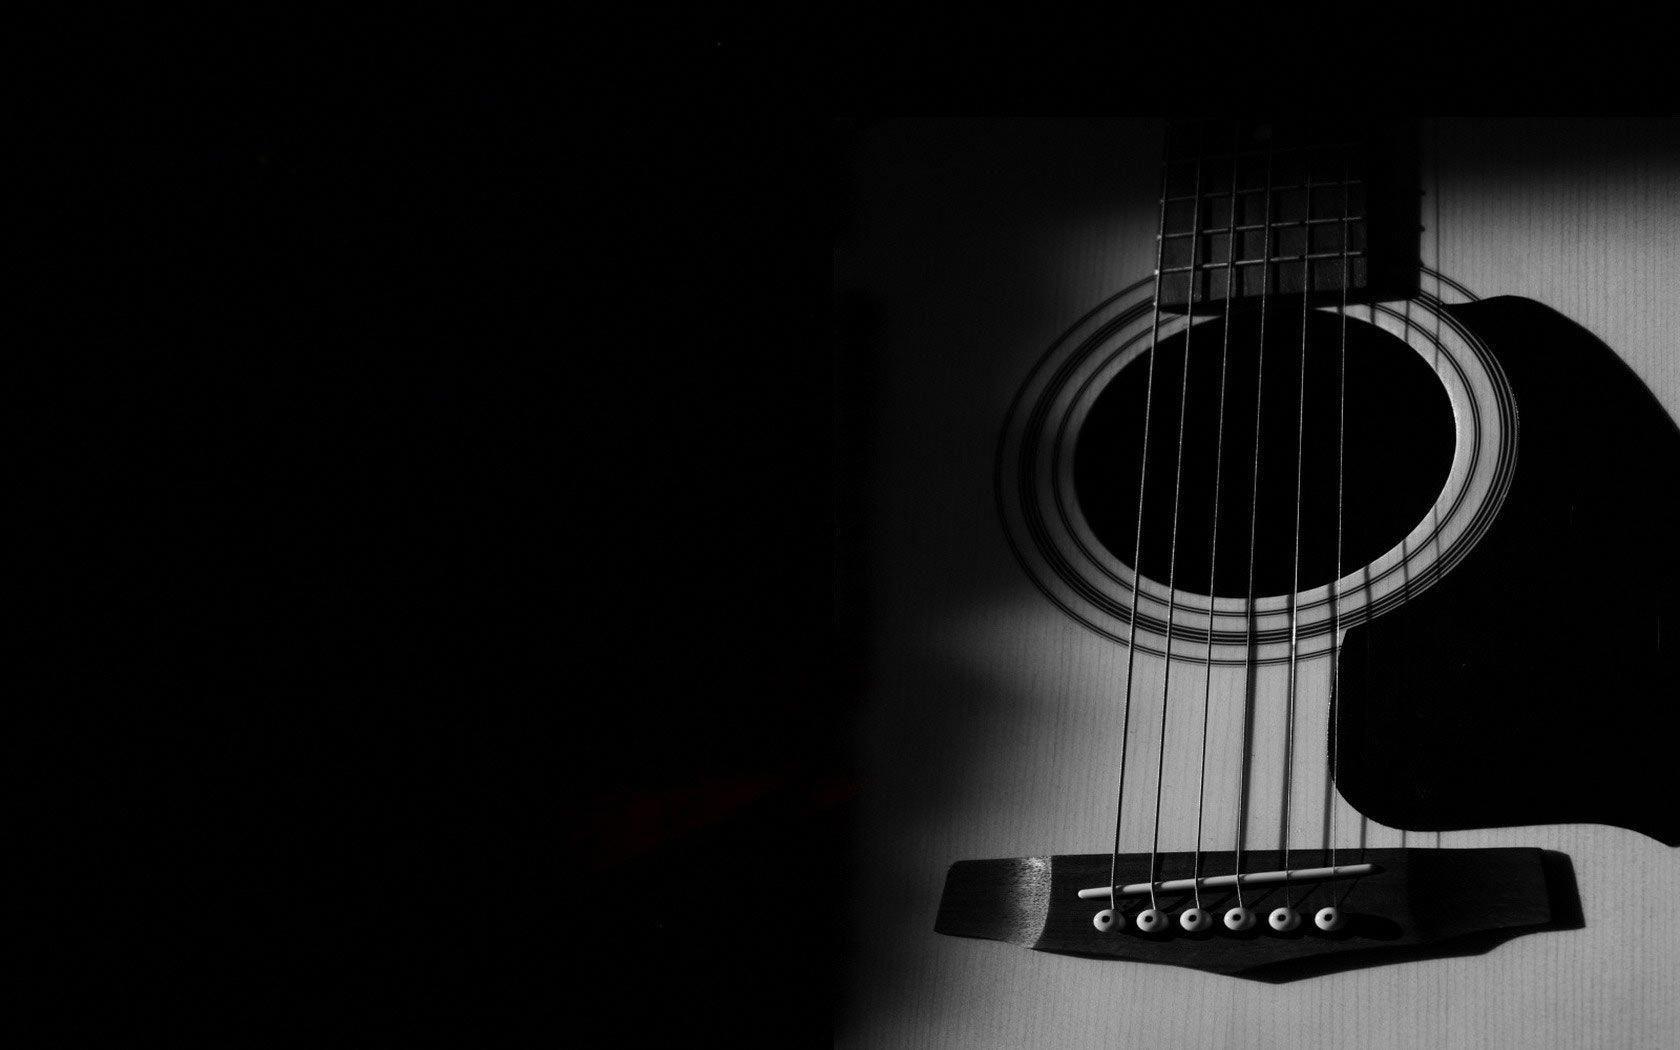 Guitar Wallpaper Hd For Desktop Wallpaper 1680 X 1050 Px 530 05 Kb Acoustic For Facebook Cover Ephiphone Fender Red Guitar Easy Guitar Acoustic Guitar Lessons